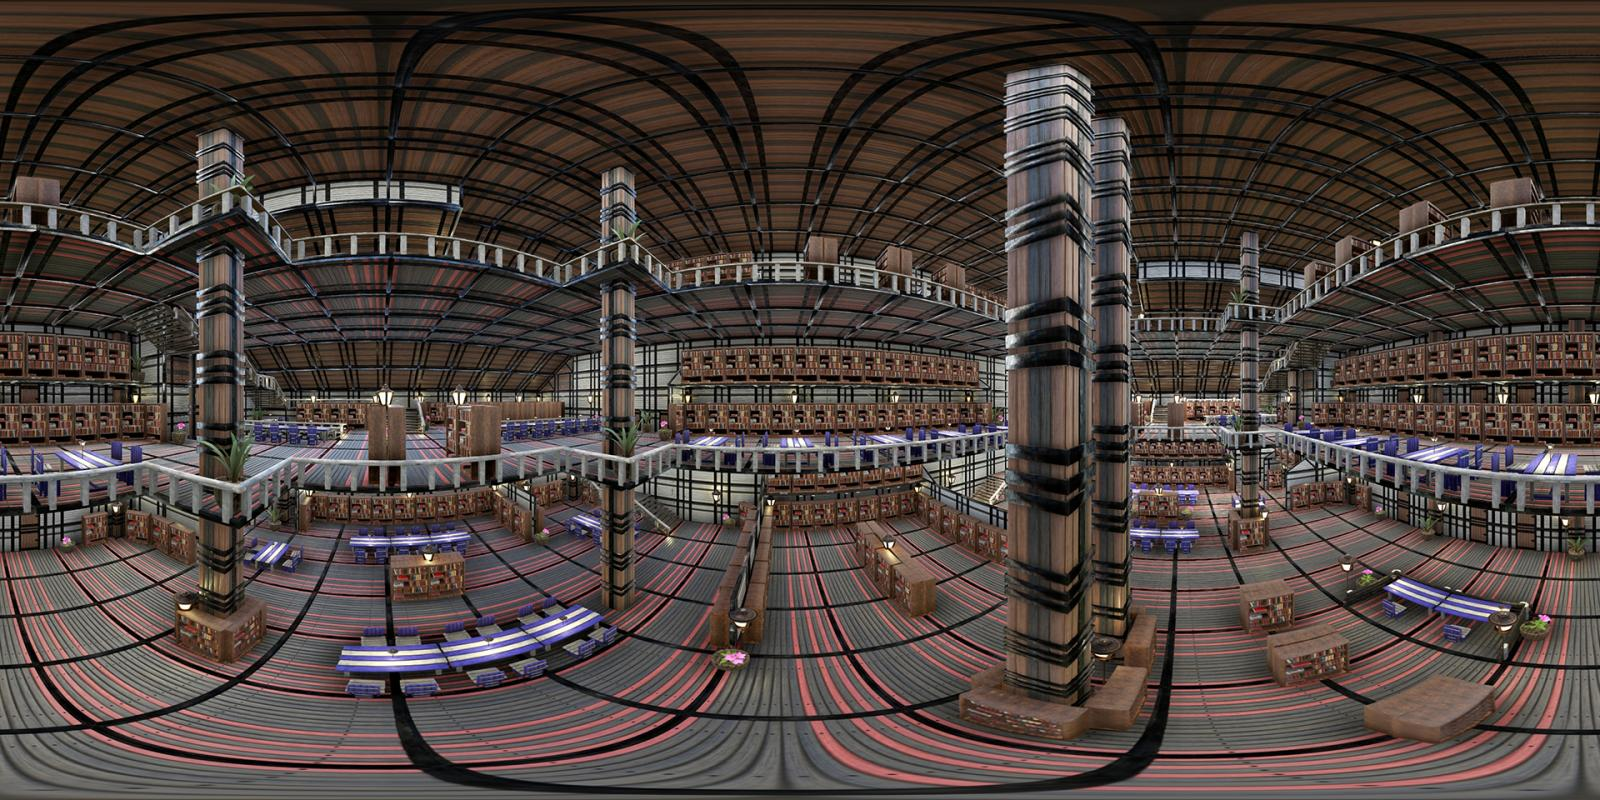 large.58a7b08cbb304_WolfAngelus-Library-360.jpg